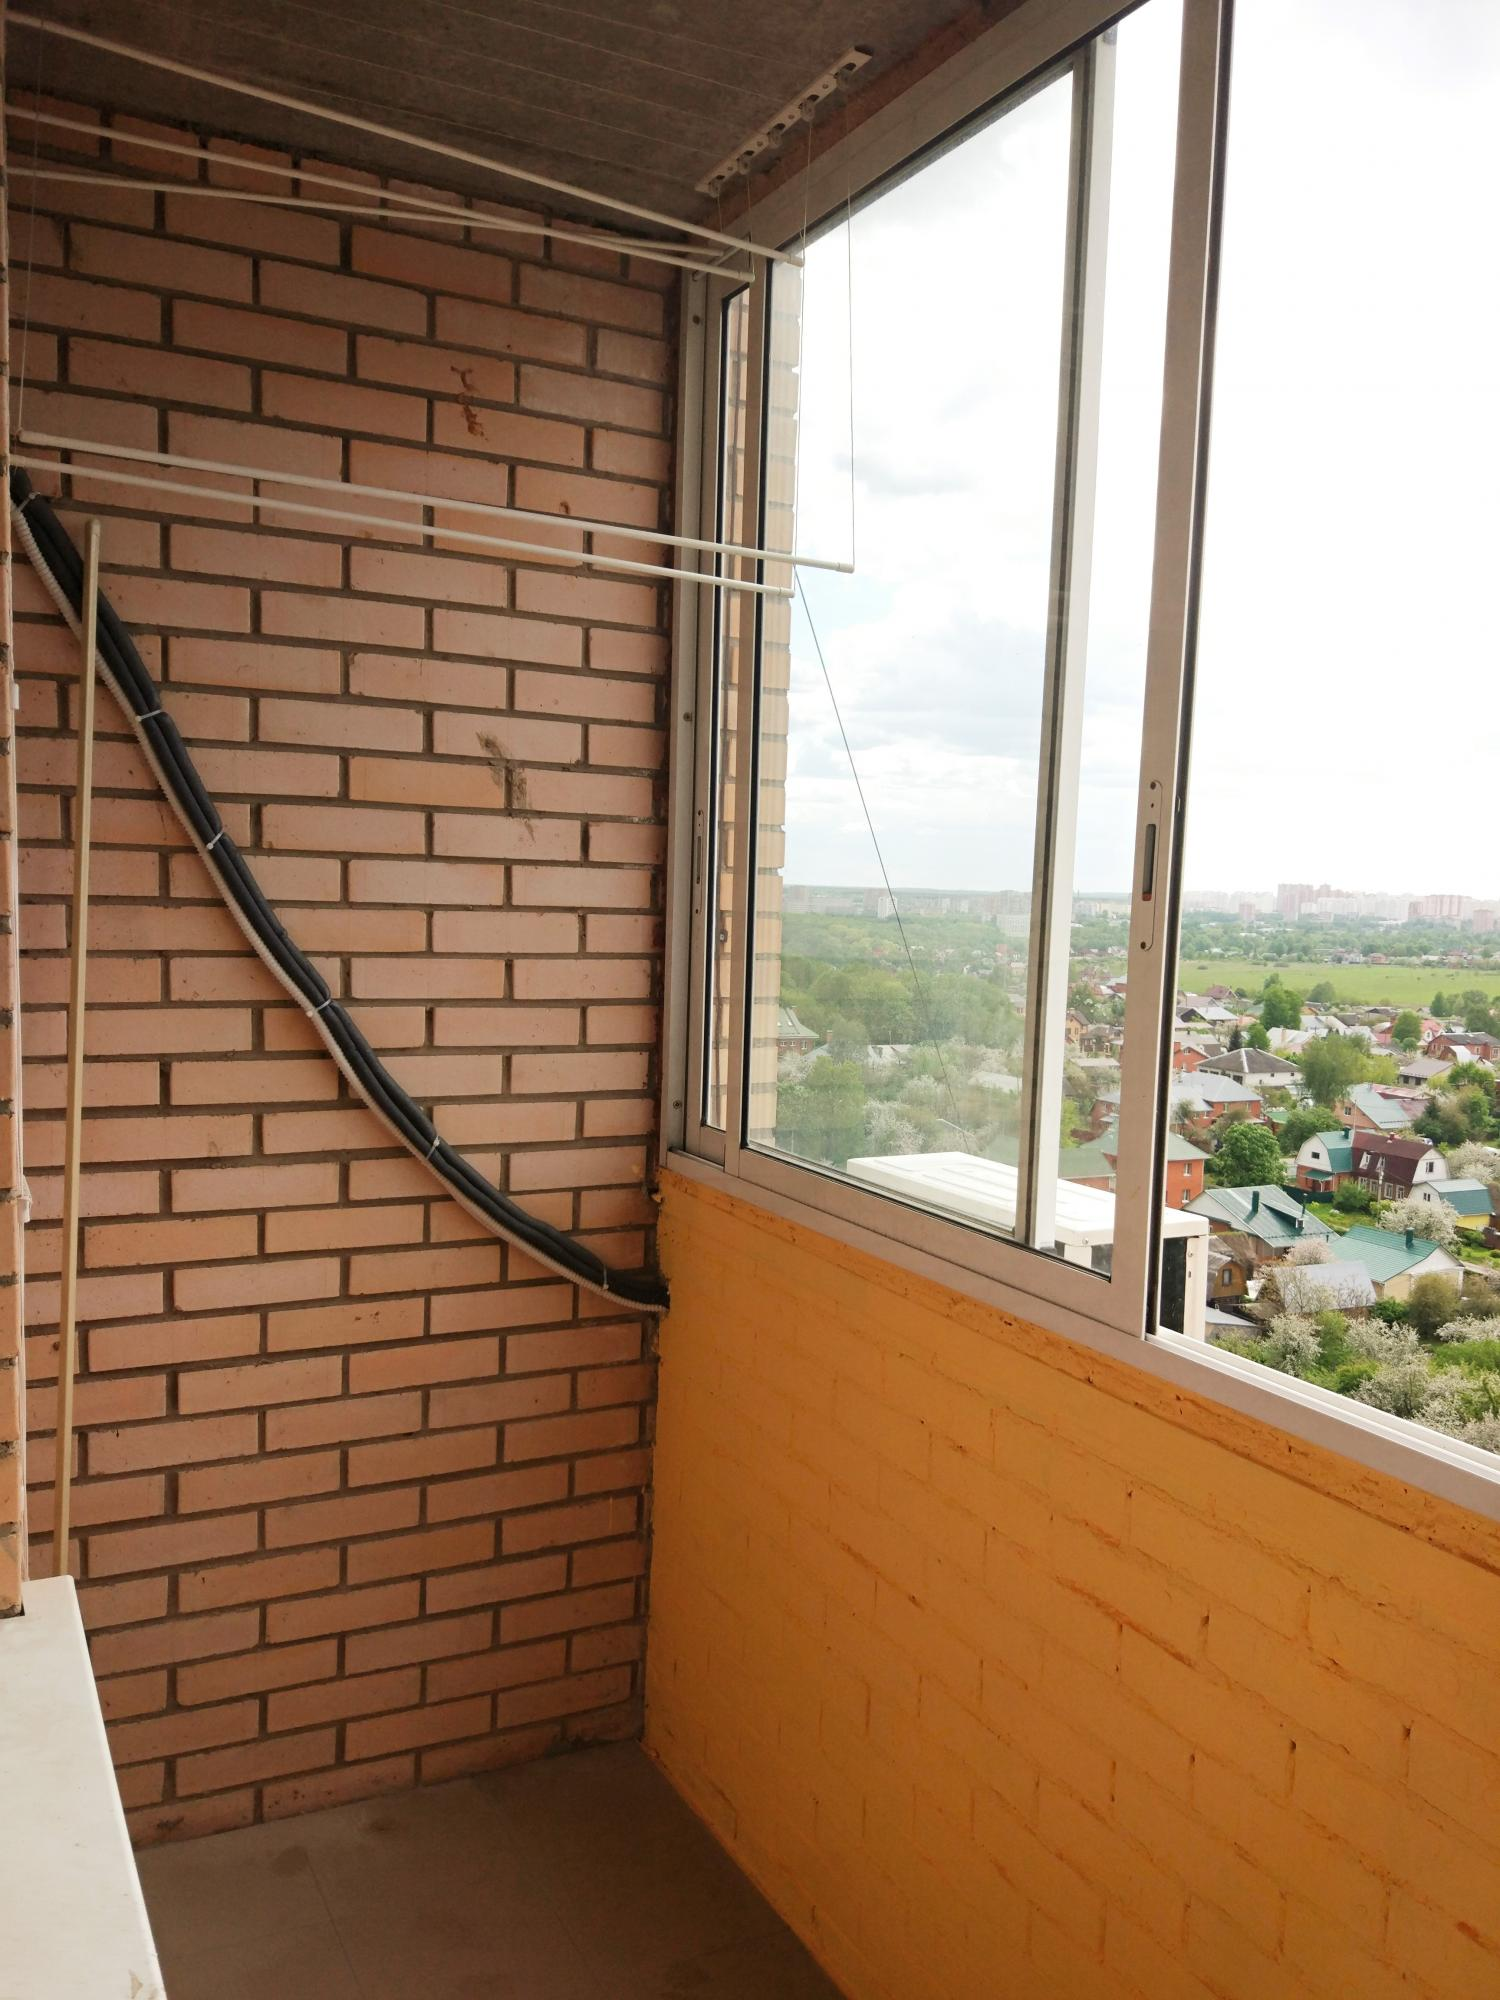 Квартира, 1 комната, 38 м² в Климовске 89258731076 купить 10